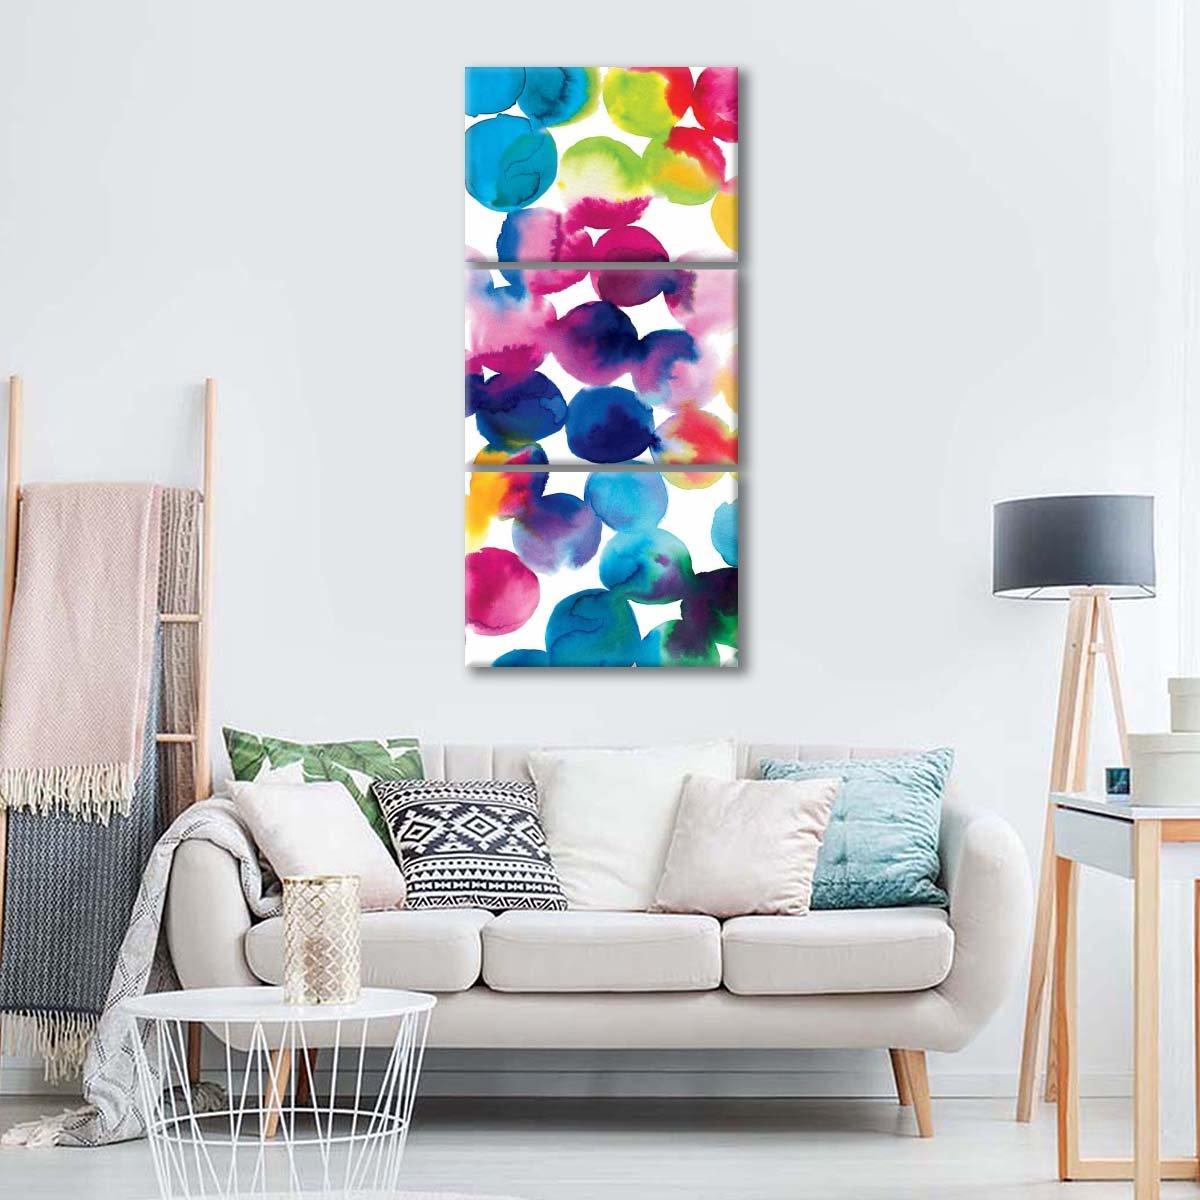 Bright Circles II Multi Panel Canvas Wall Art